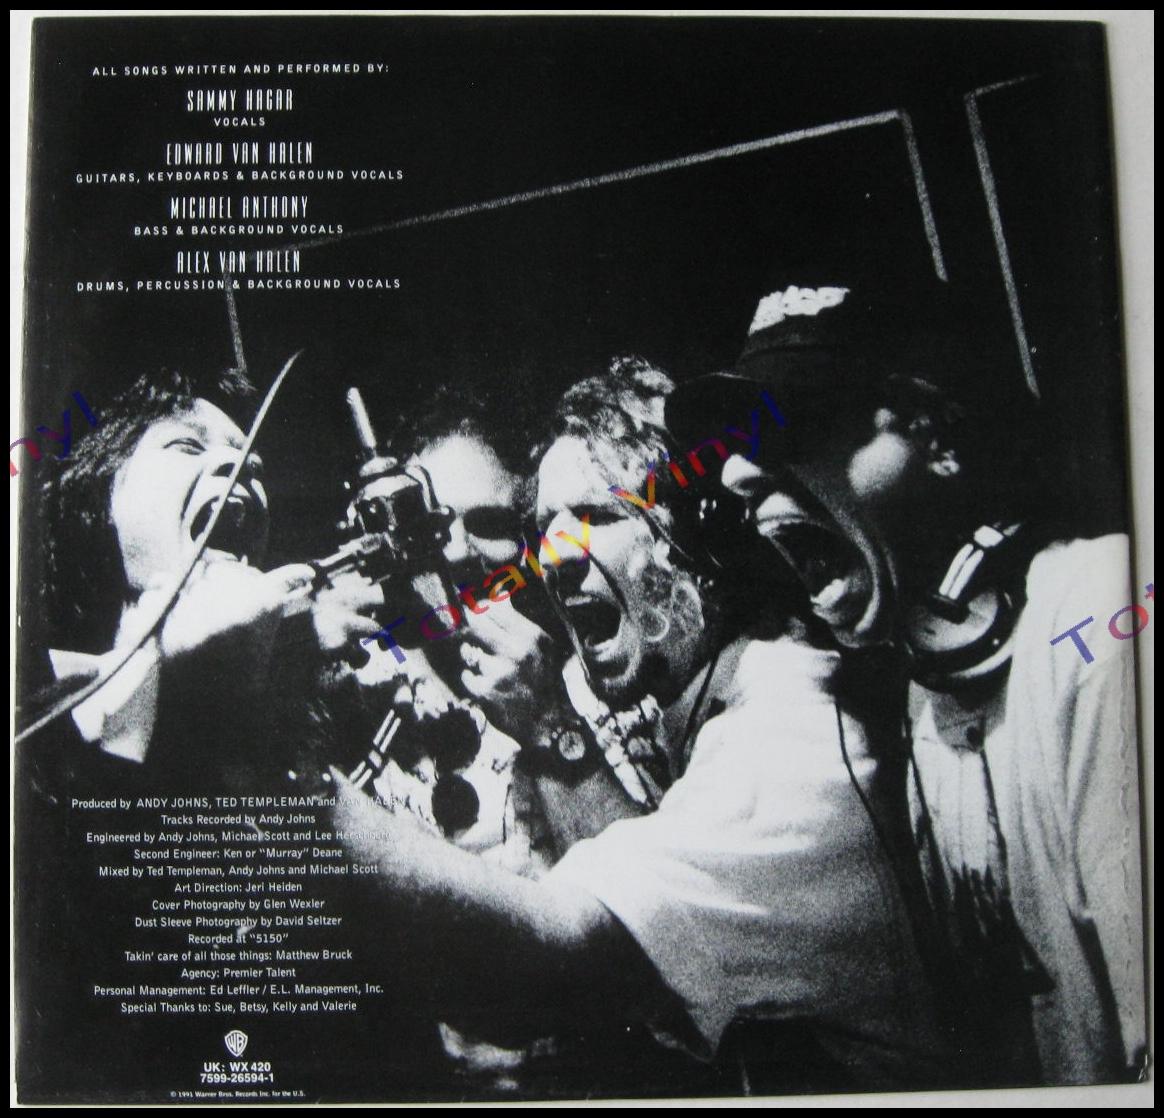 Totally Vinyl Records Van Halen For Unlawful Carnal Knowledge Lp